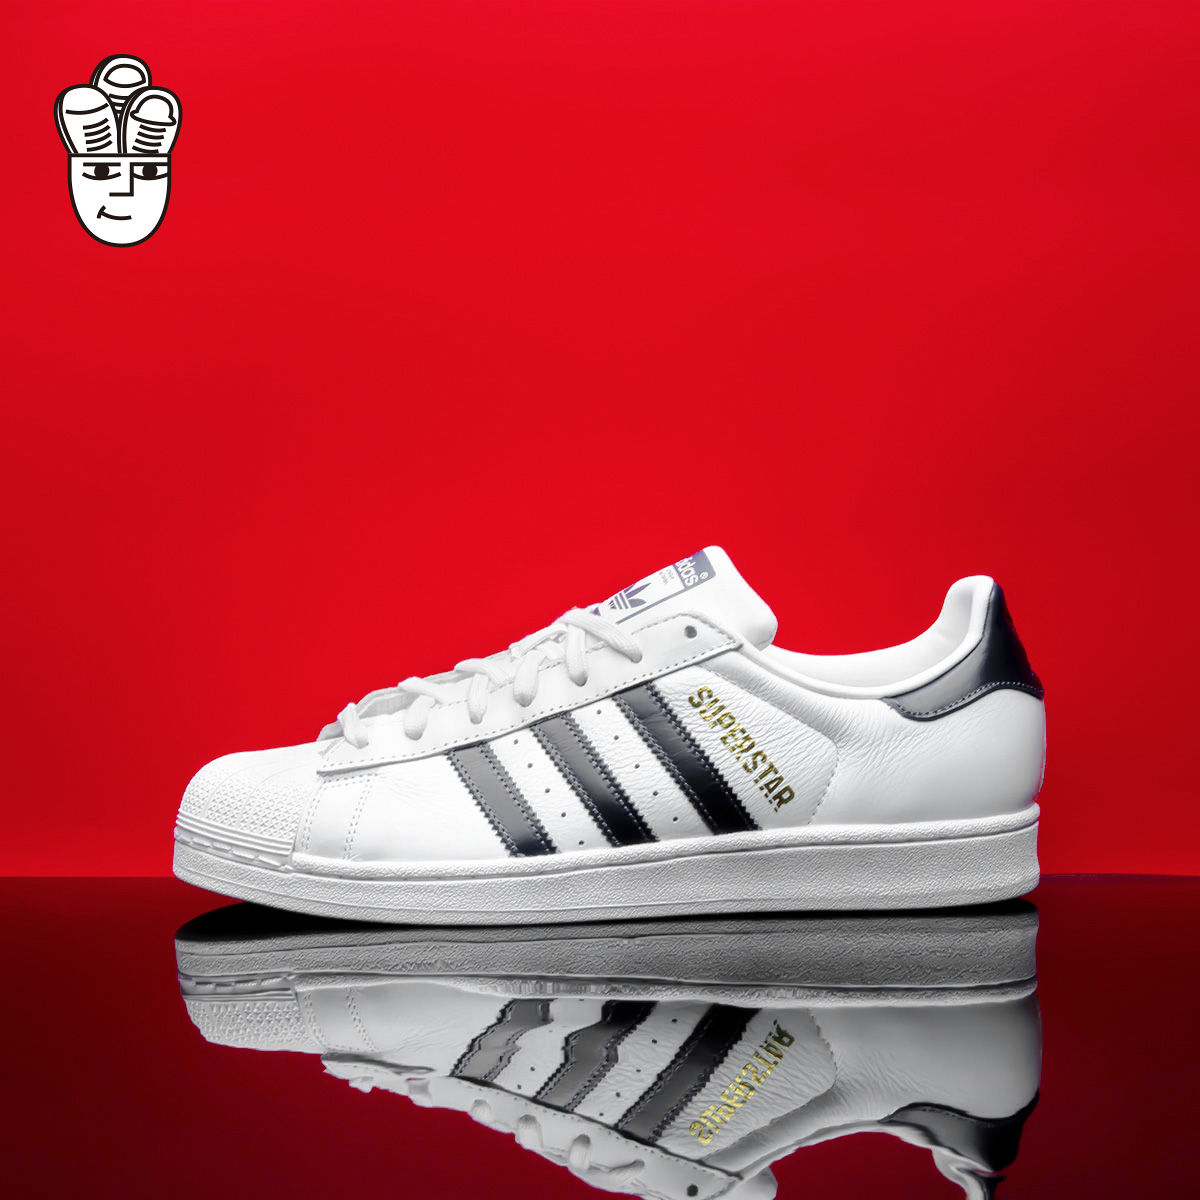 Adidas Superstar 阿迪达斯 男子 贝壳头板鞋 运动休闲鞋